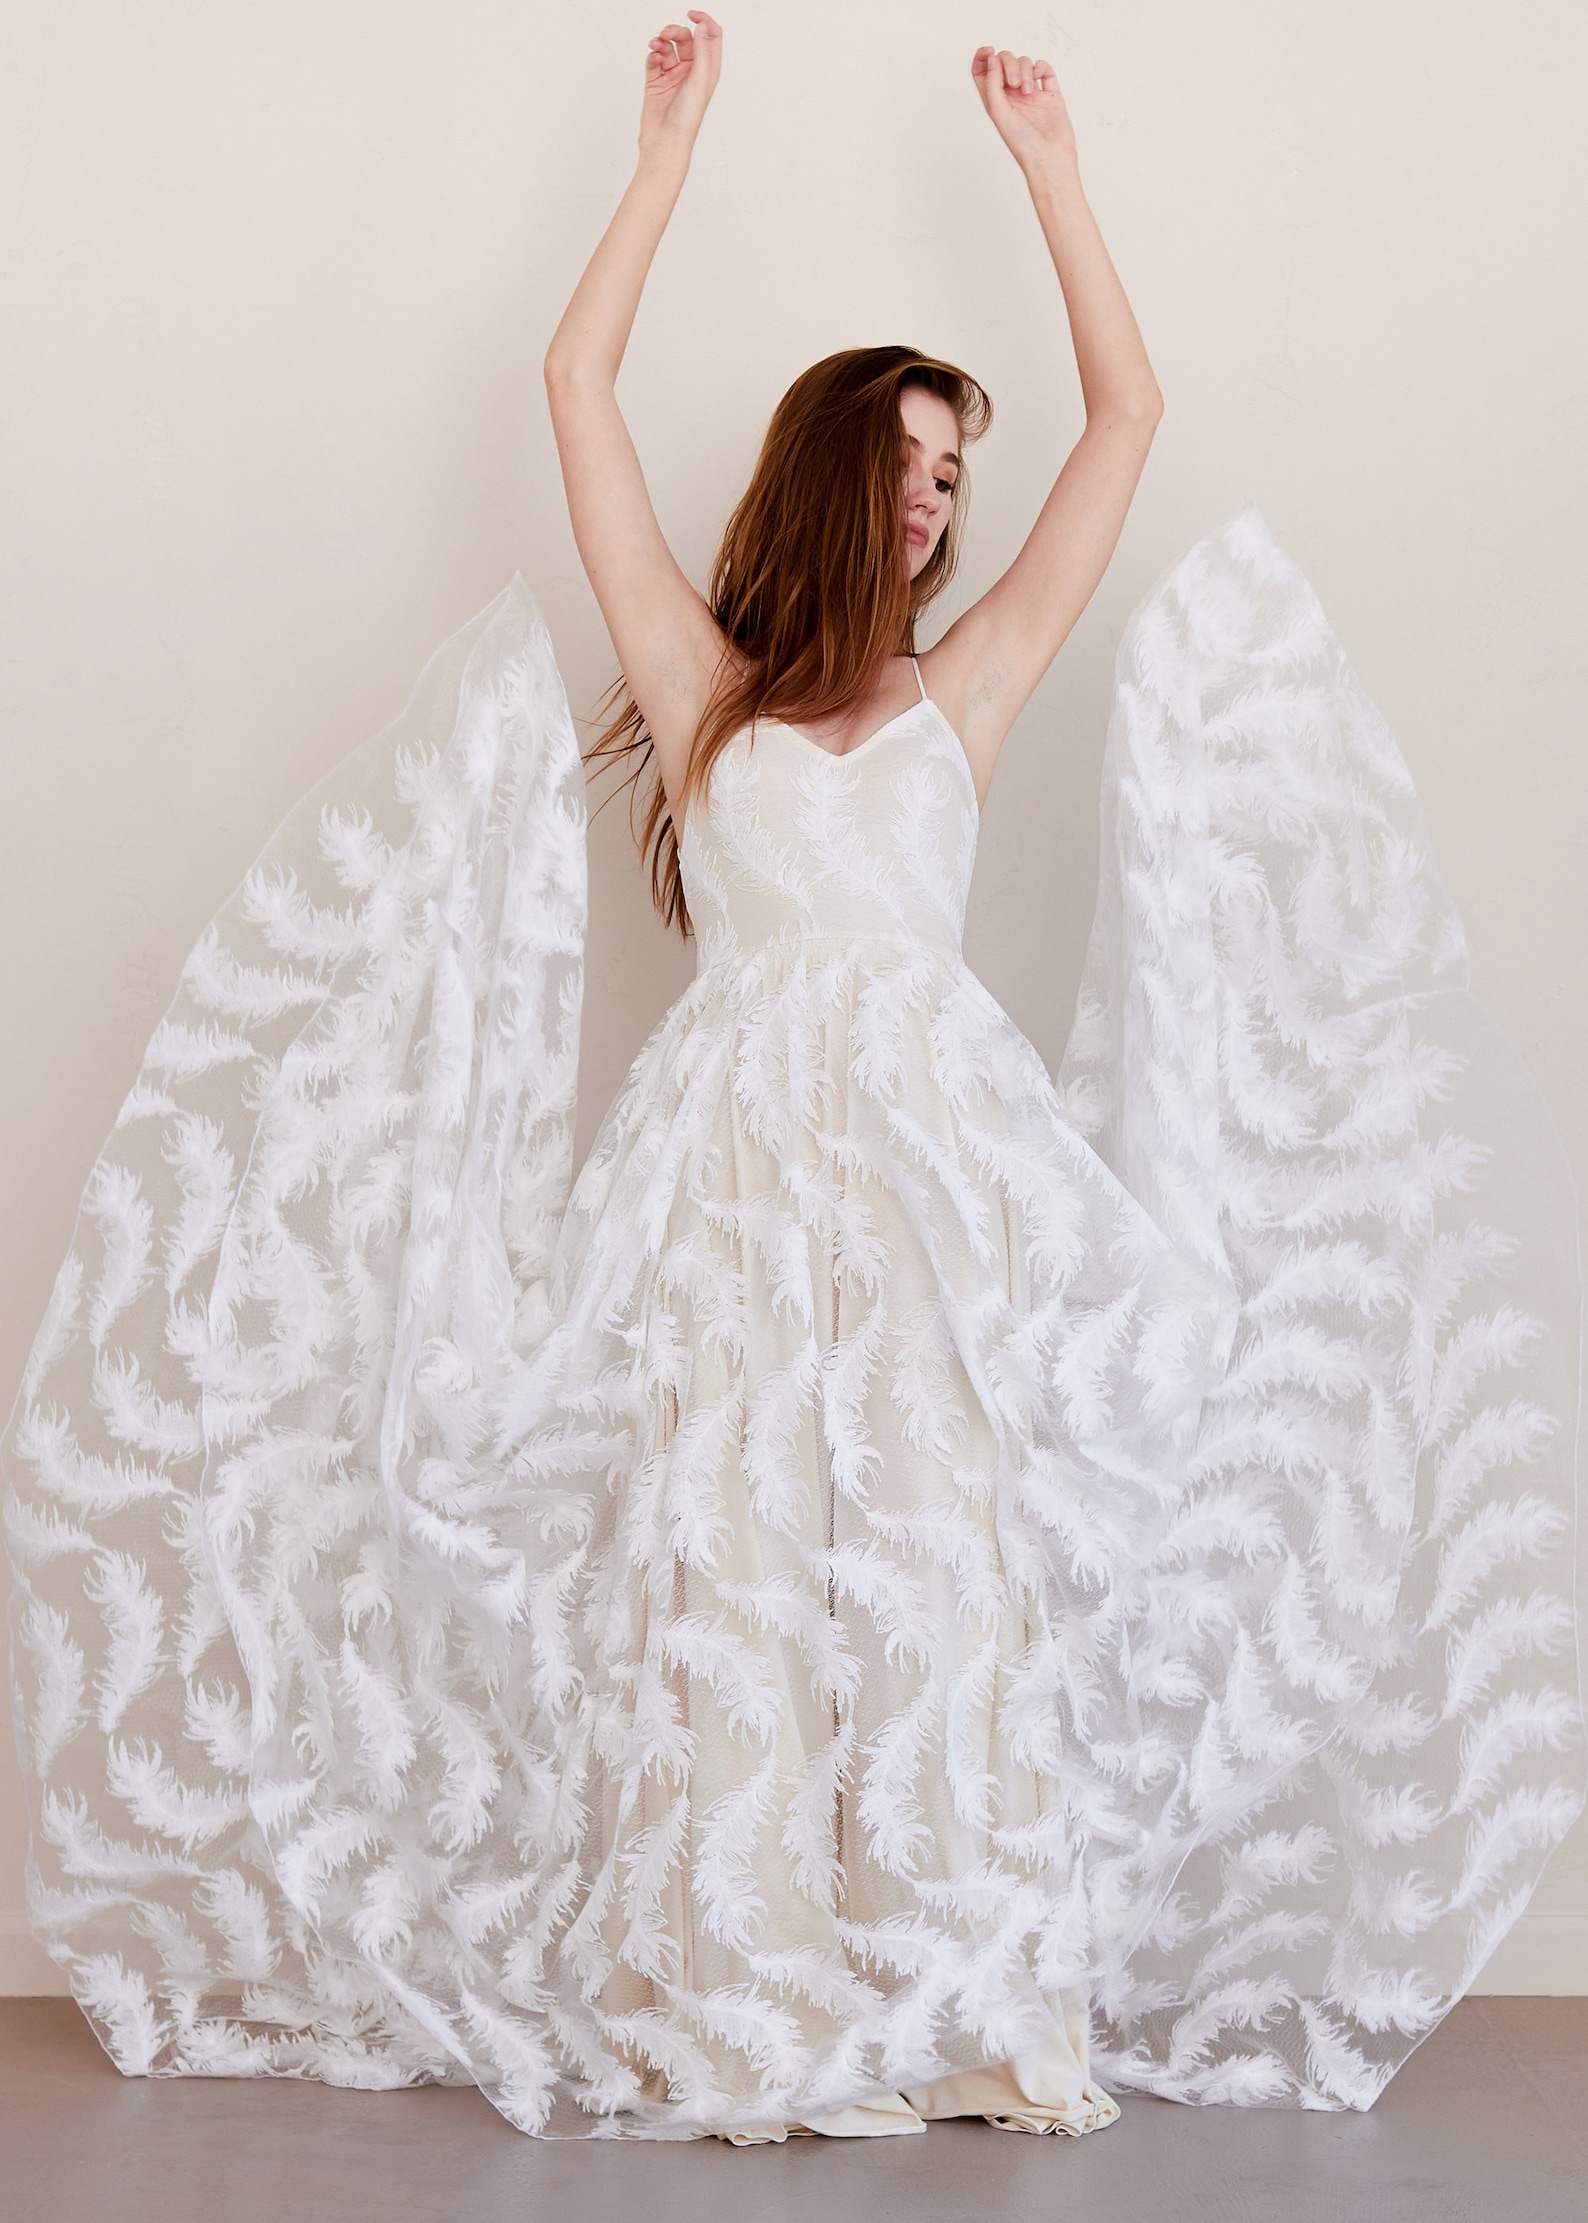 Feather print wedding dress